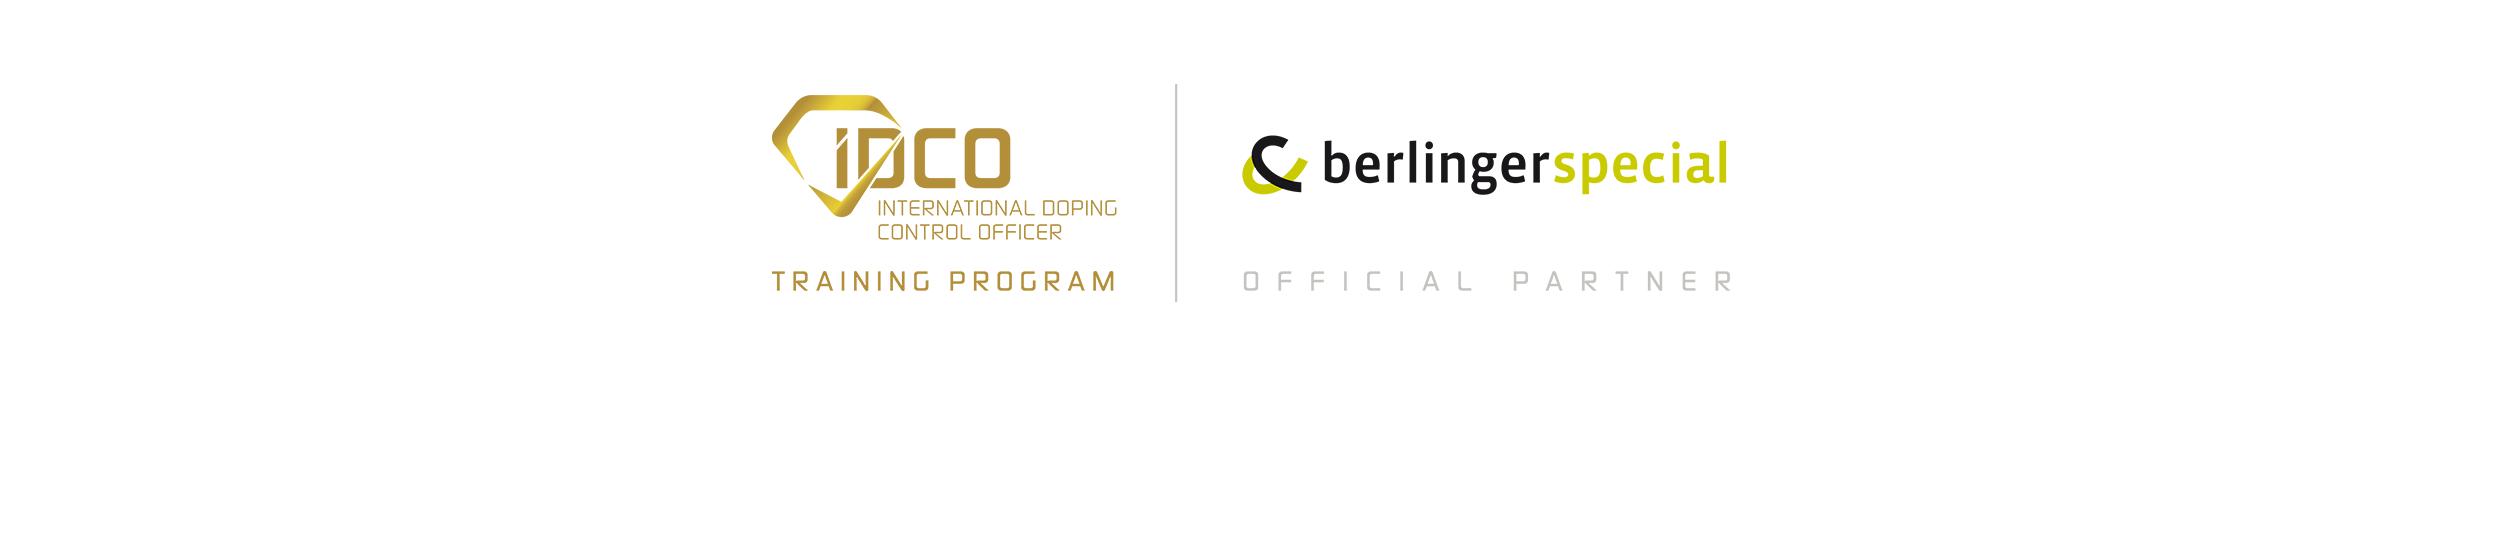 Raising and harmonising the standards of doping controls worldwide: one year of the ITA IDCO Training Program